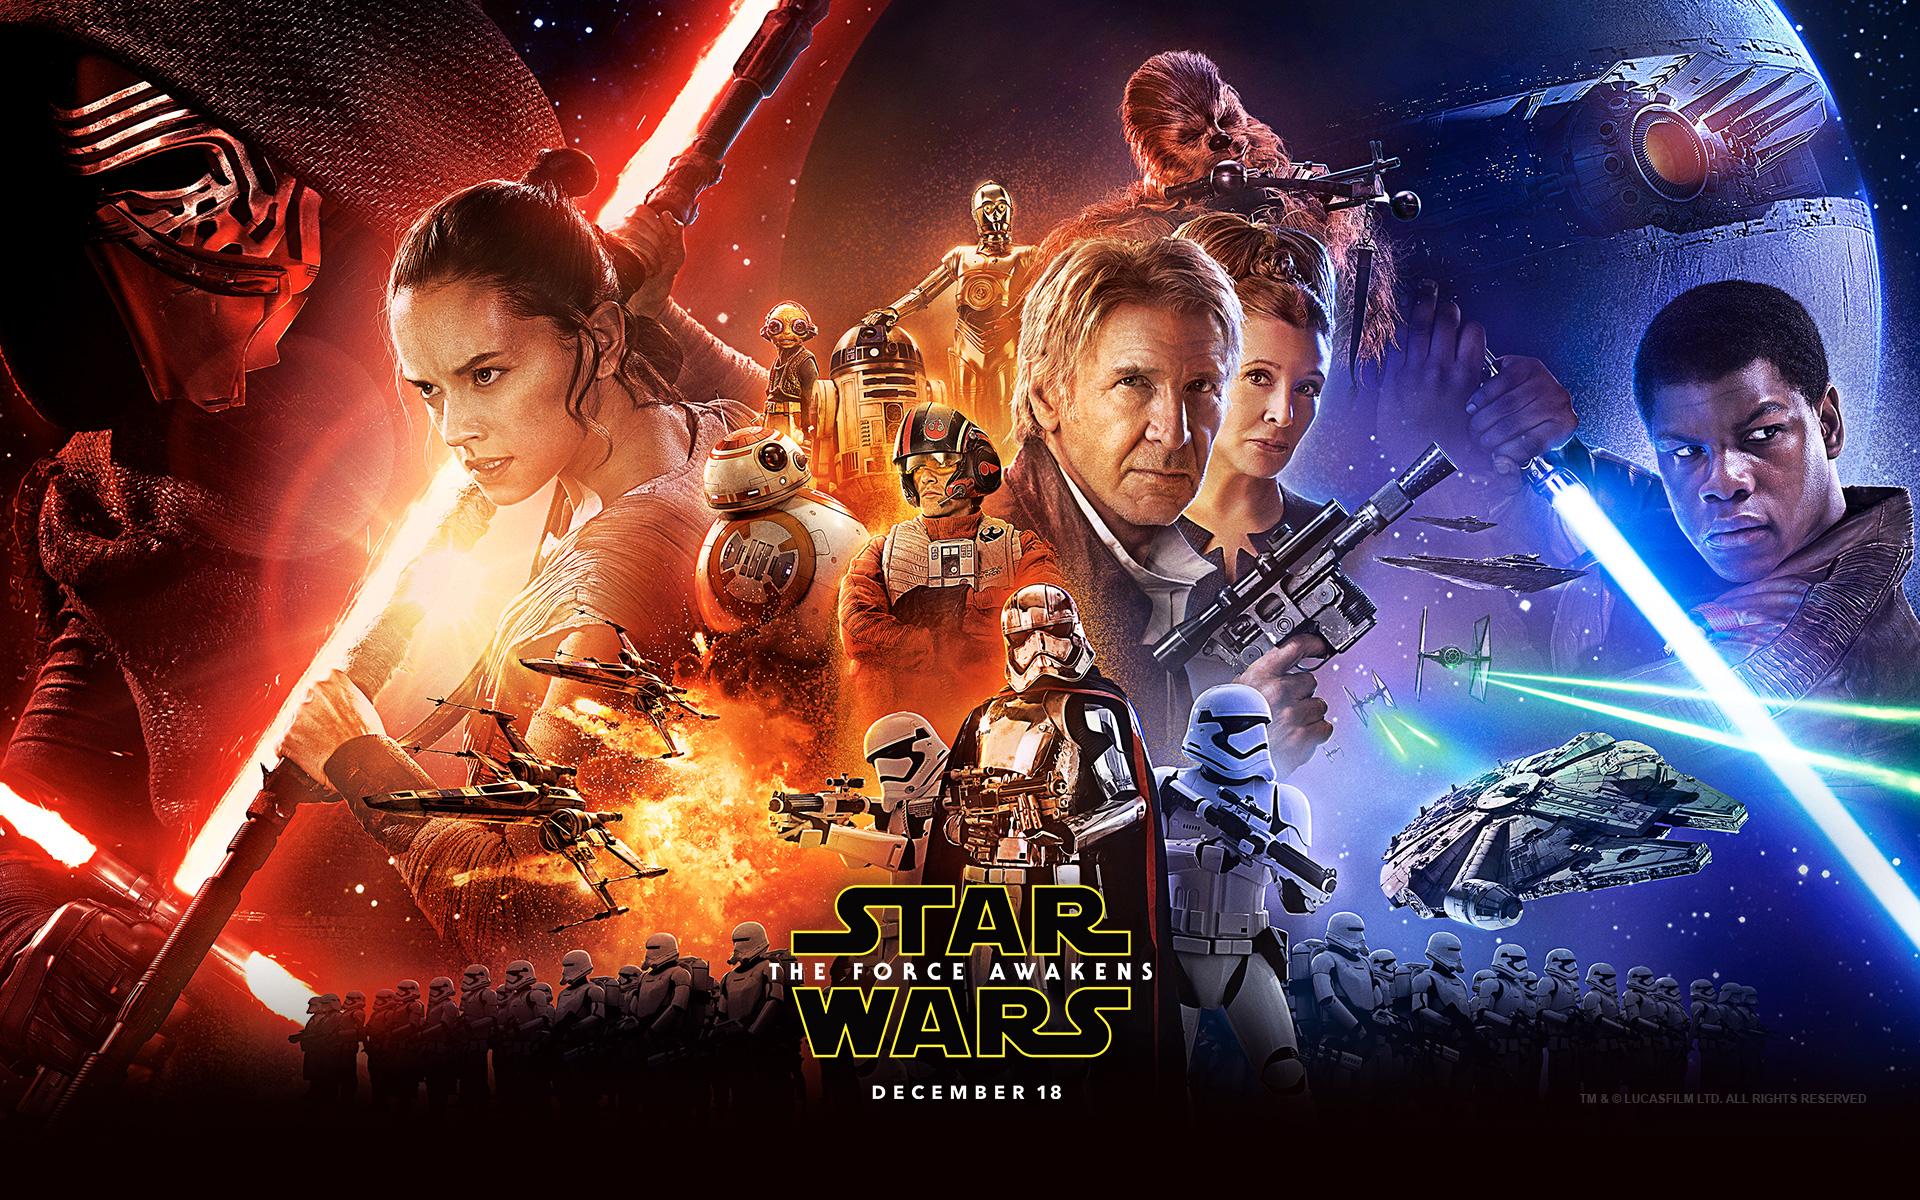 star wars episode 1 swesub